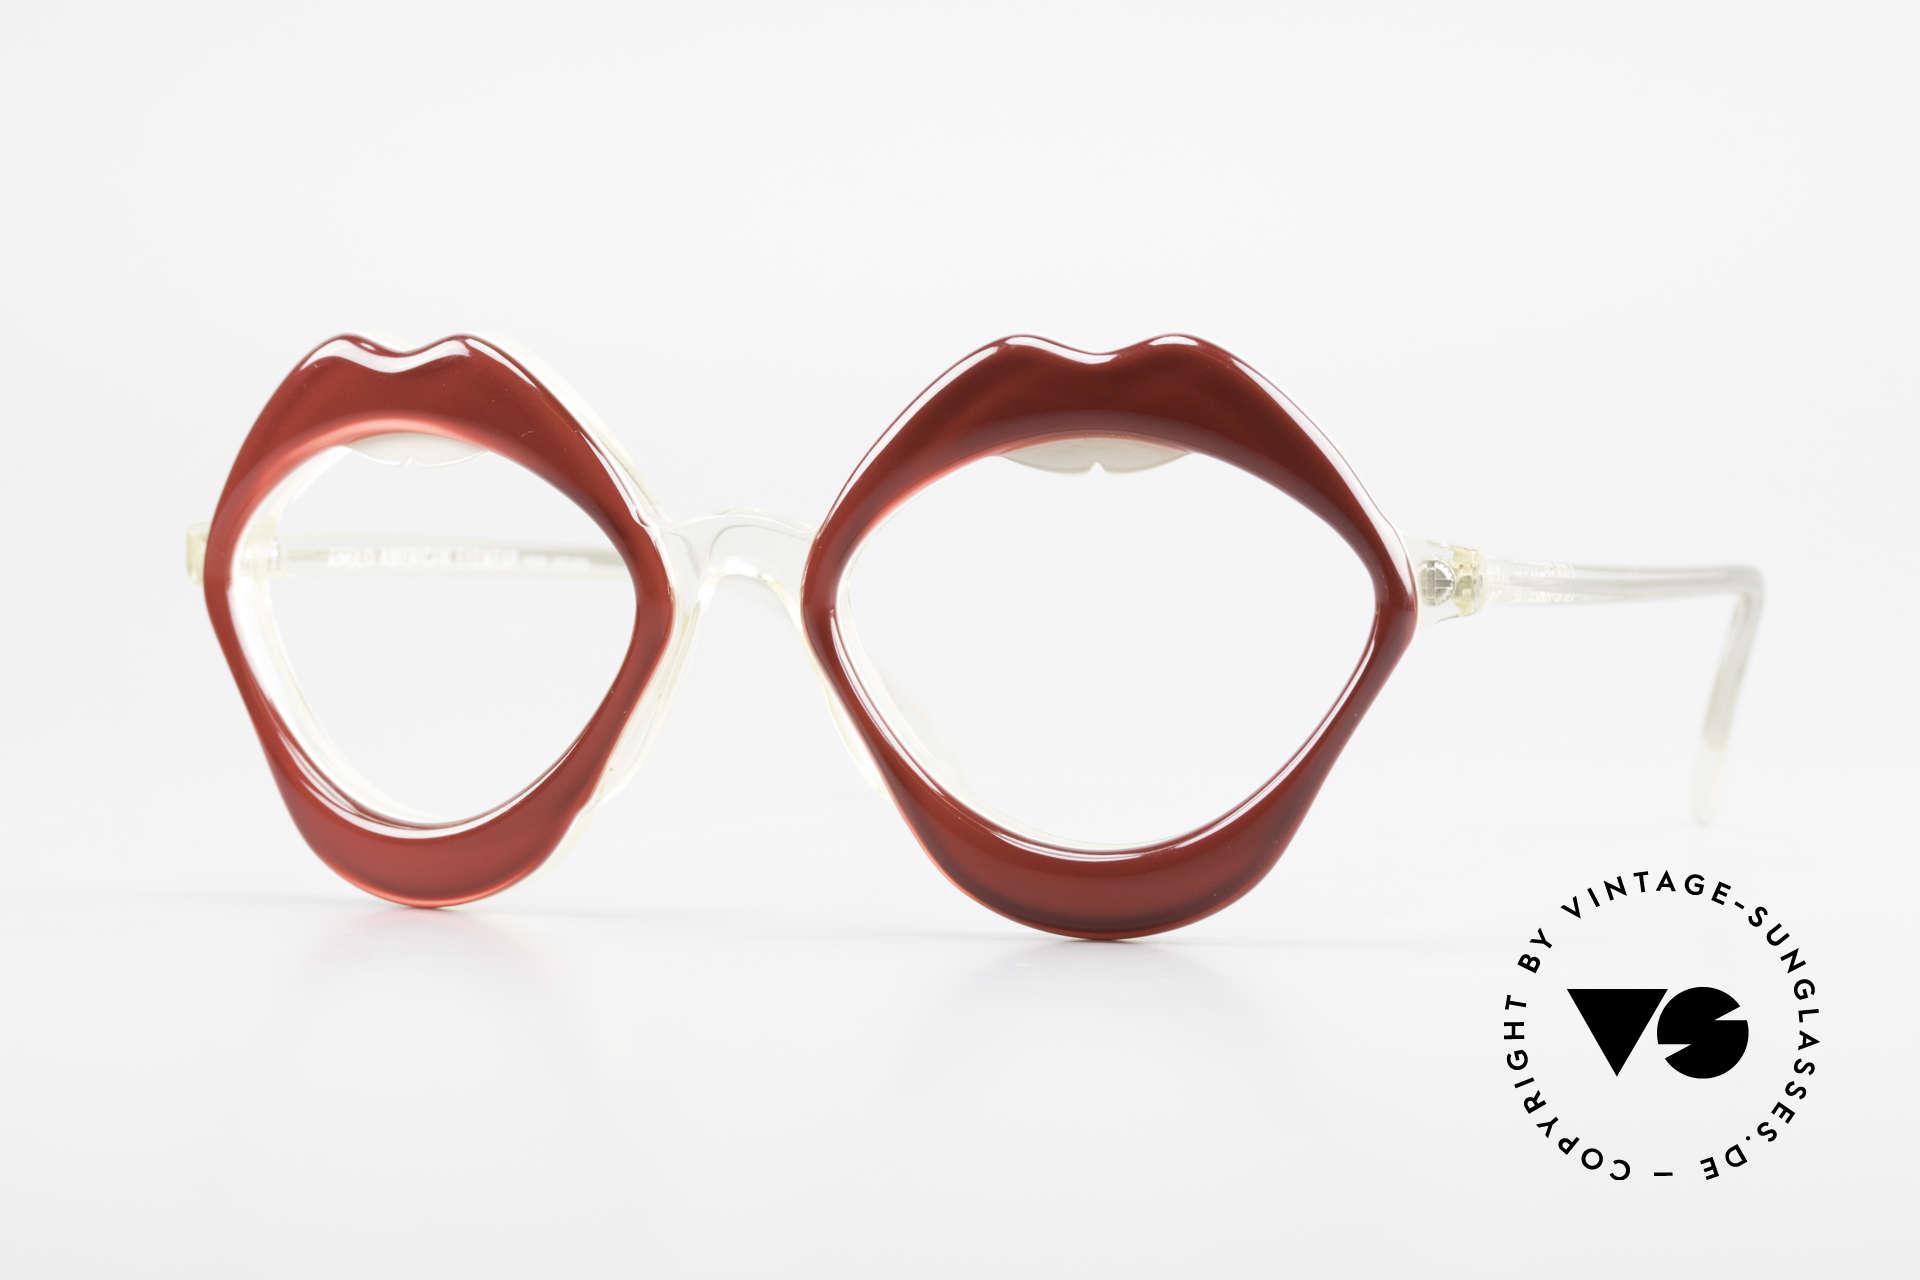 Anglo American Optical LIPS AAO Lippenbrille 60er Original, AAO, Anglo American Optical - model. LIPS (Lippen), Passend für Damen